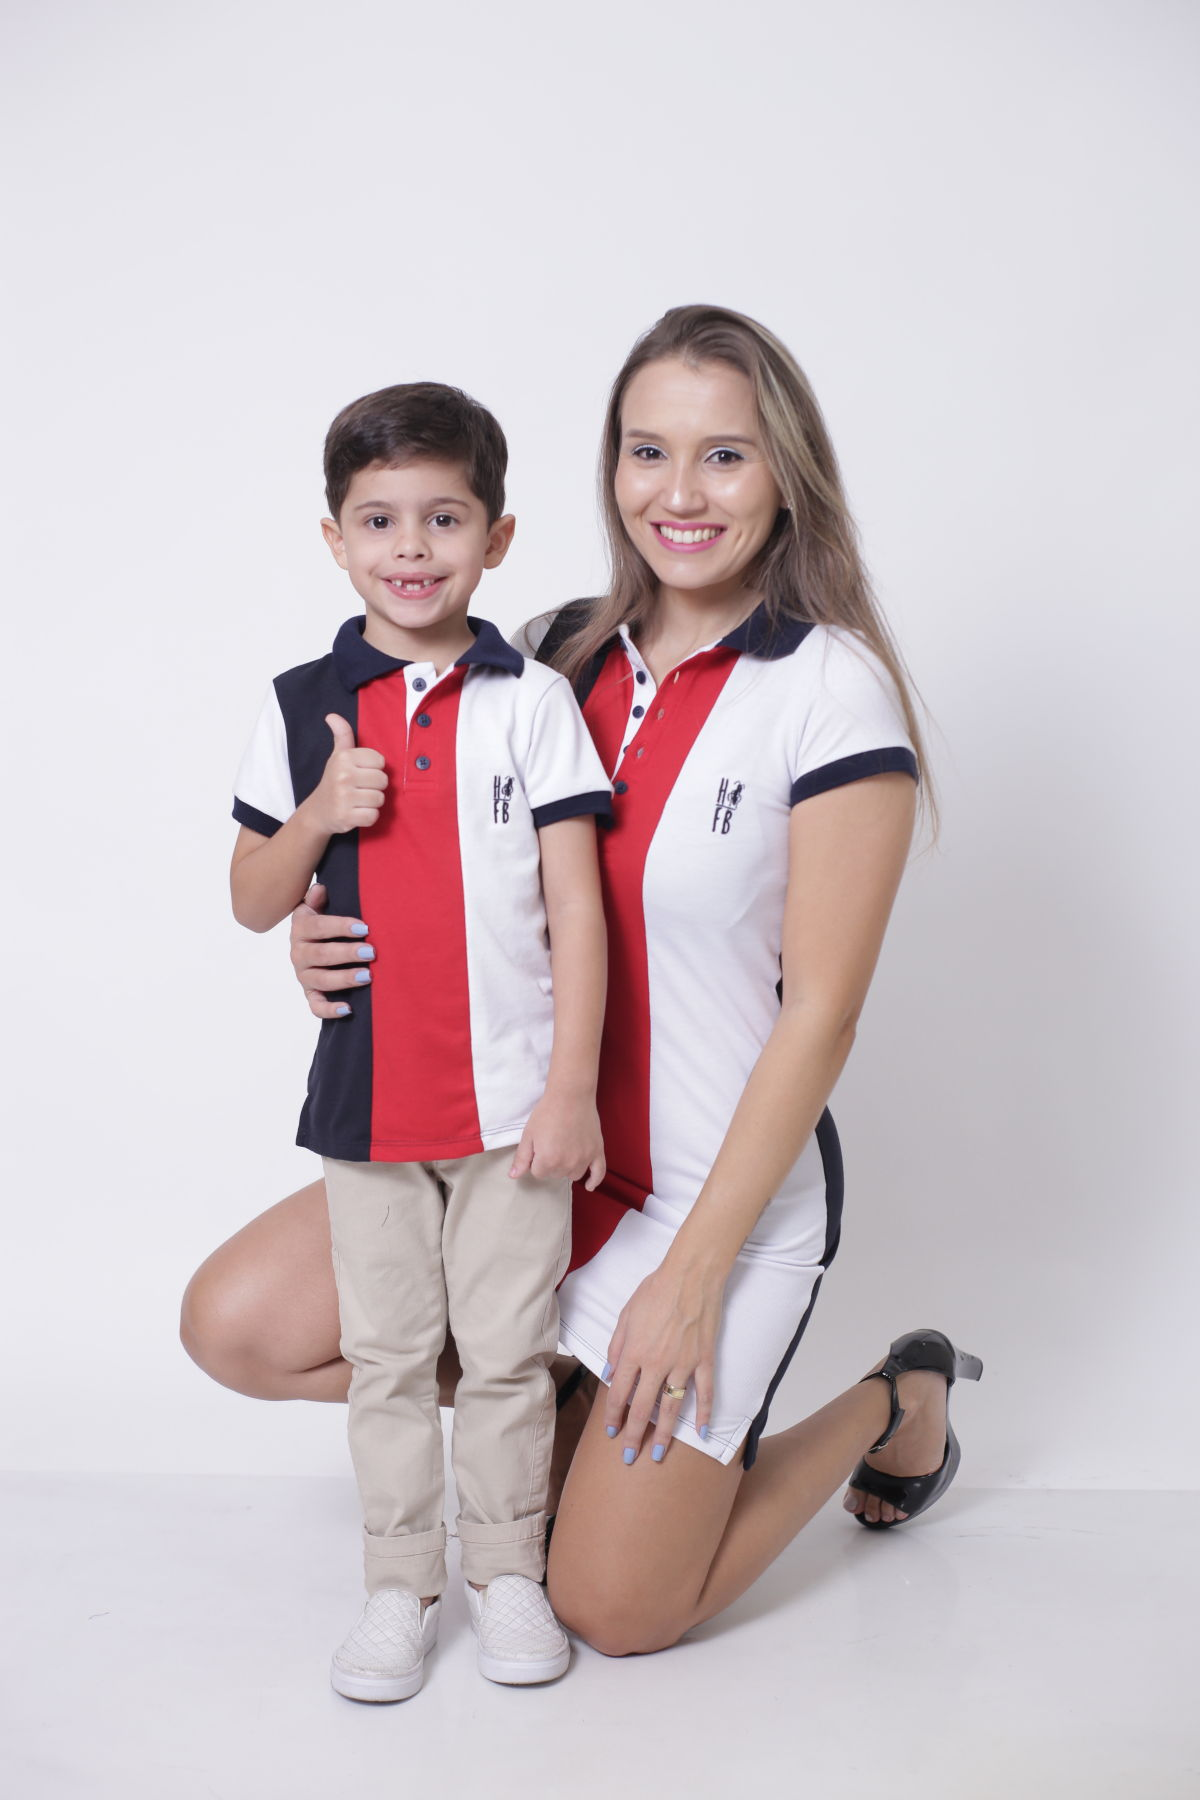 MÃE E FILHO > Kit 02 peças - Vestido + Camisa ou Body Polo - Listrados King [Coleção Tal Mãe Tal Filho]  - Heitor Fashion Brazil